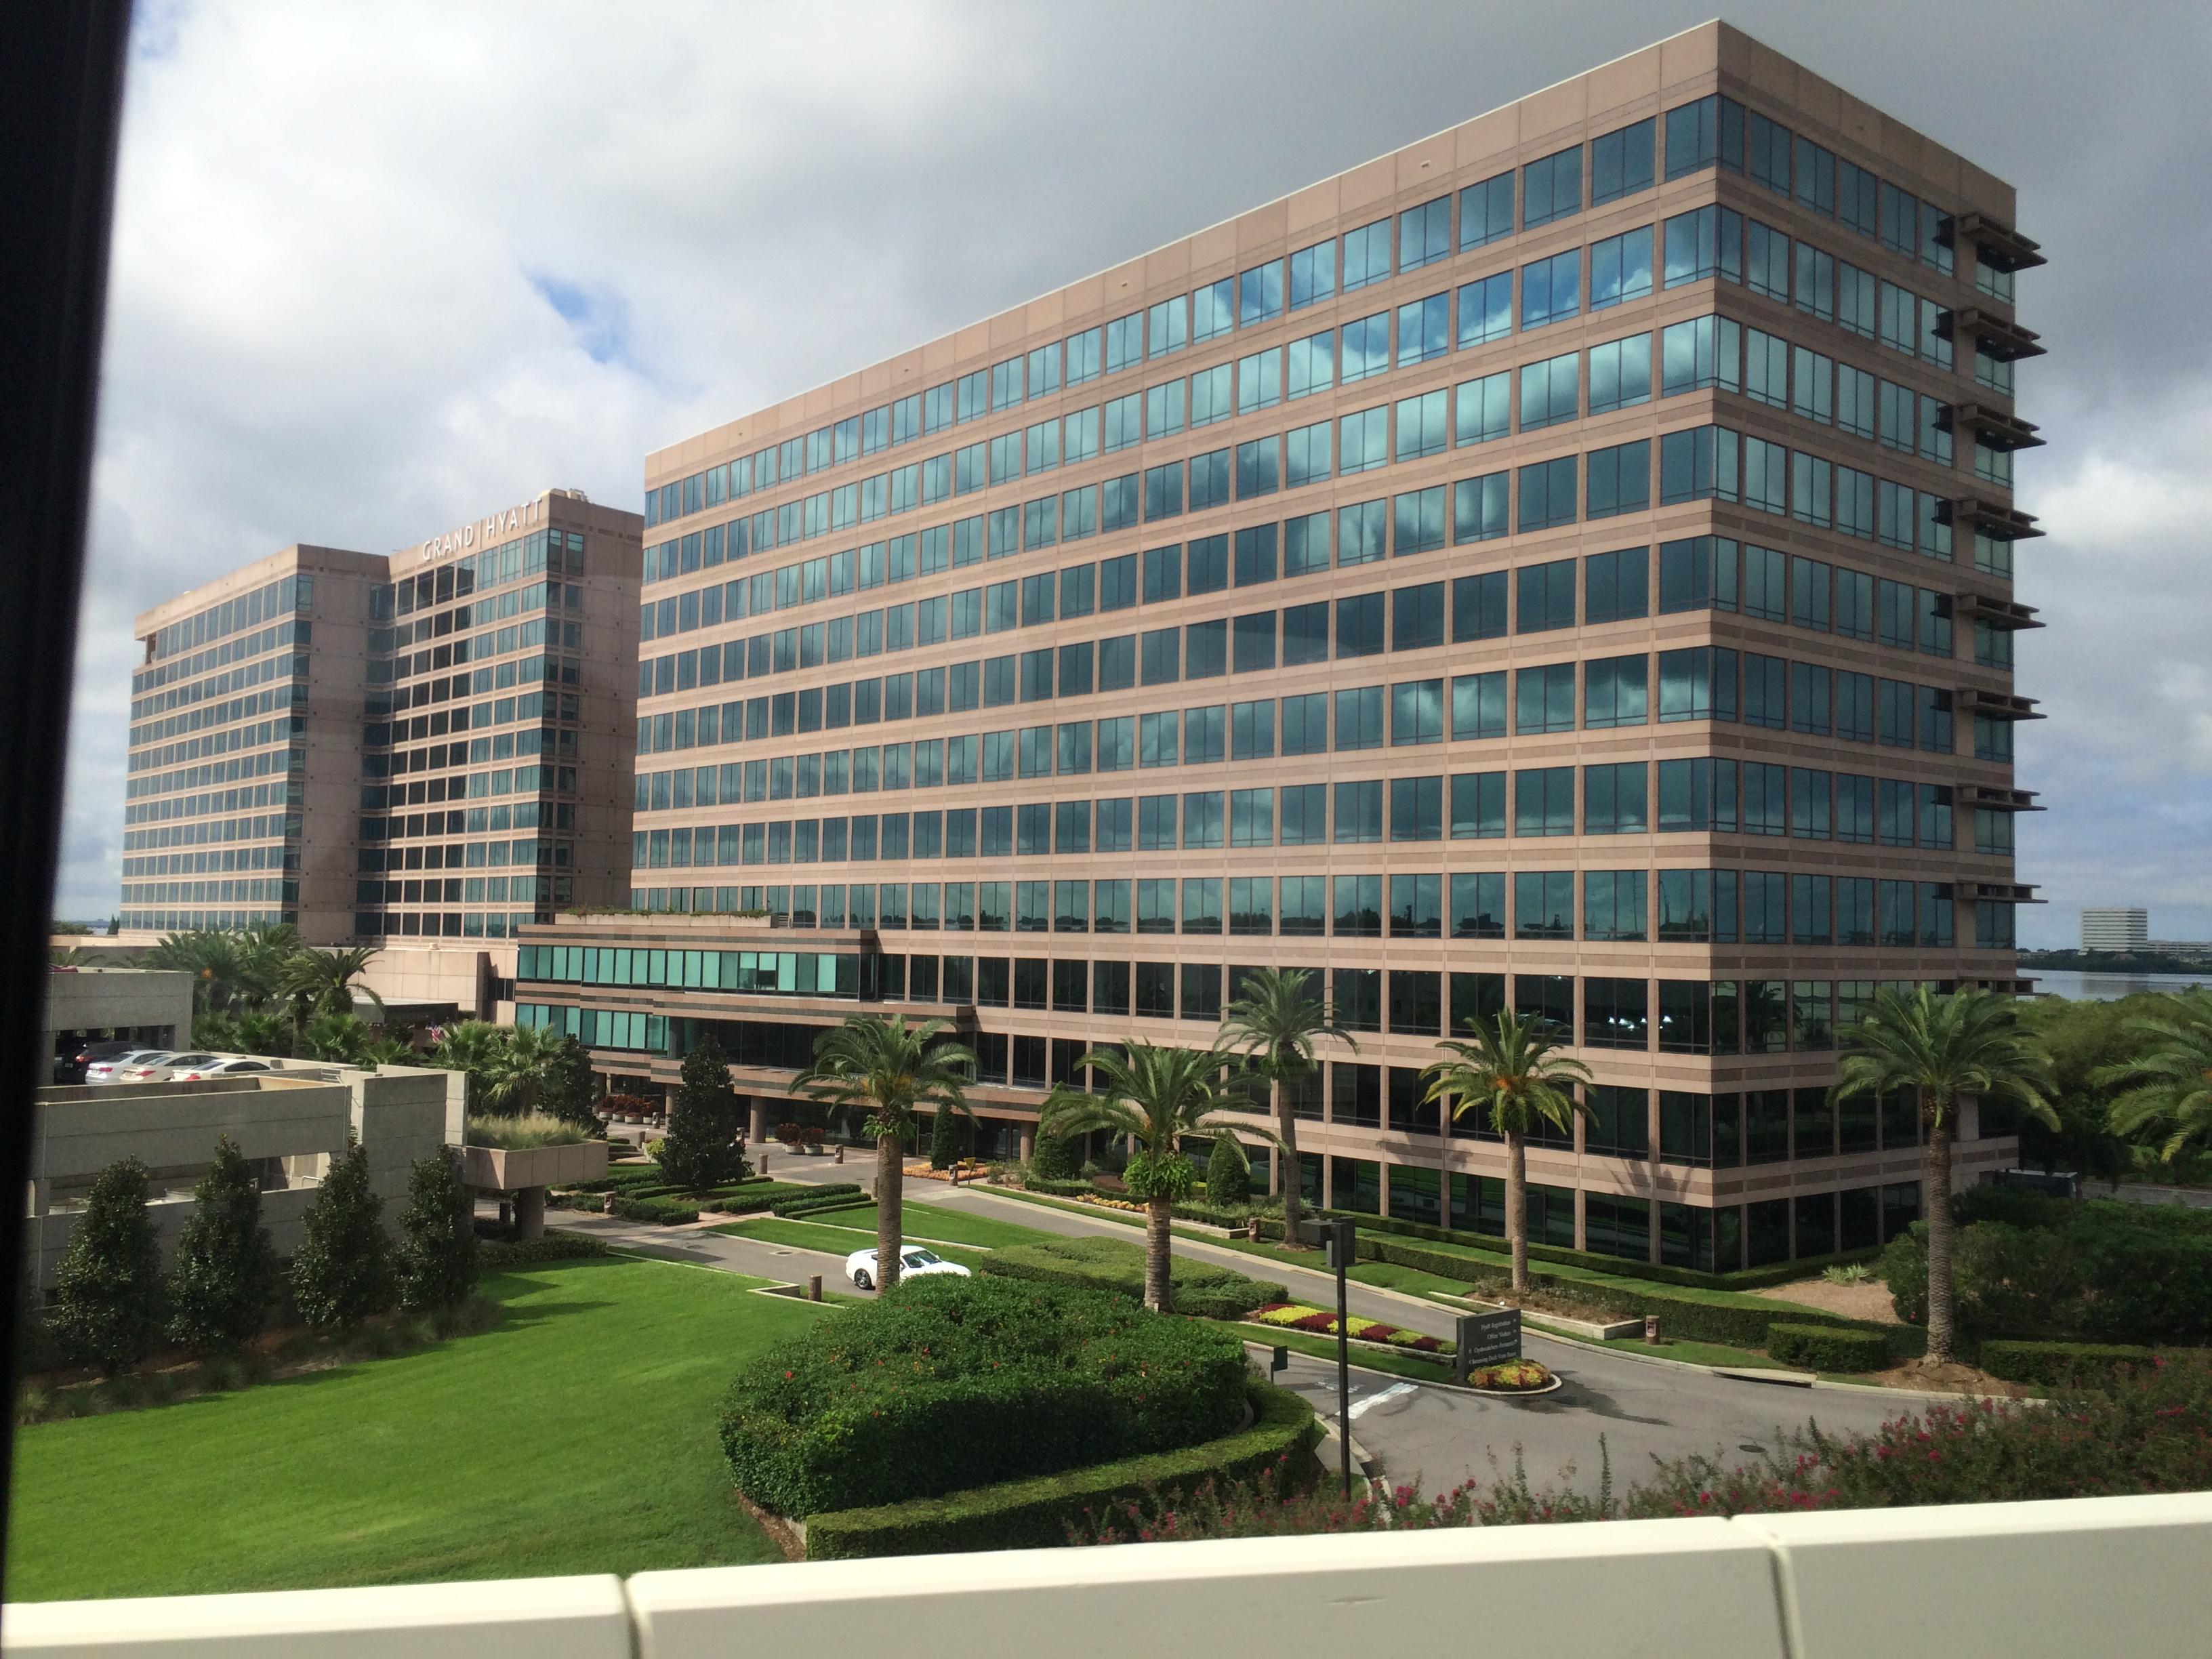 Grand Hyatt Tampa hotel